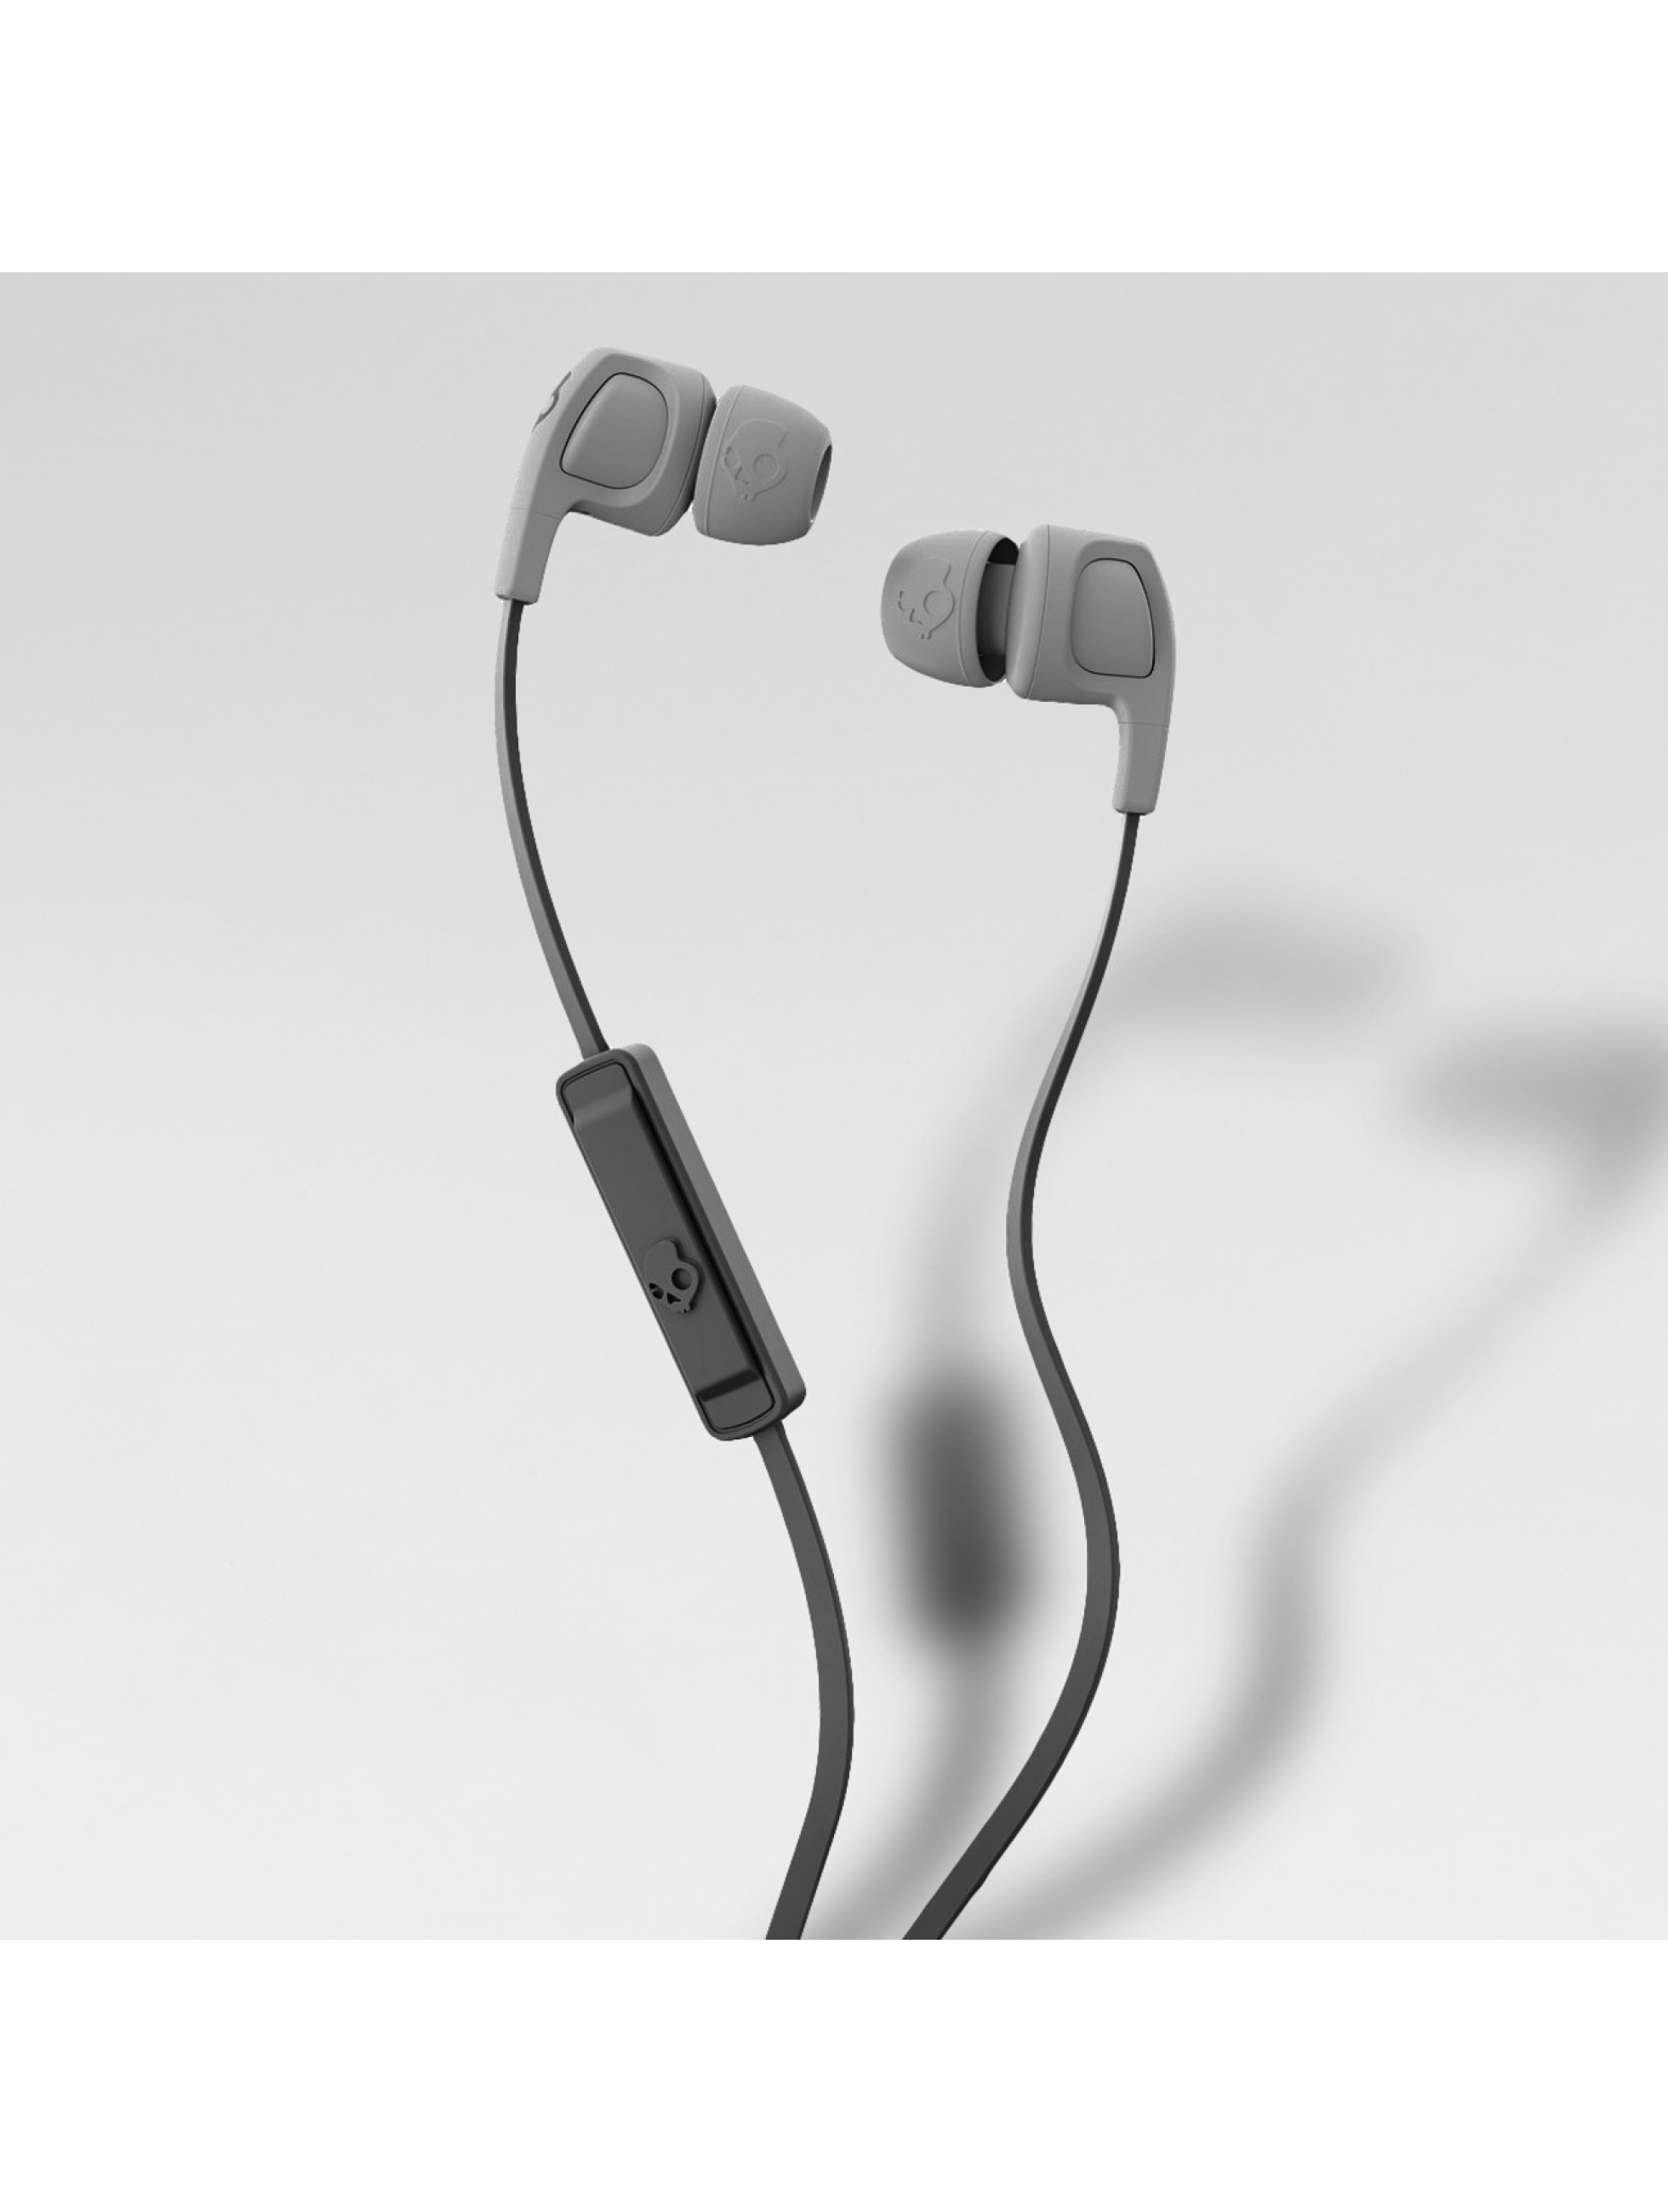 Skullcandy Høretelefoner Smokin Bud 2 Mic 1 In Earphones grå